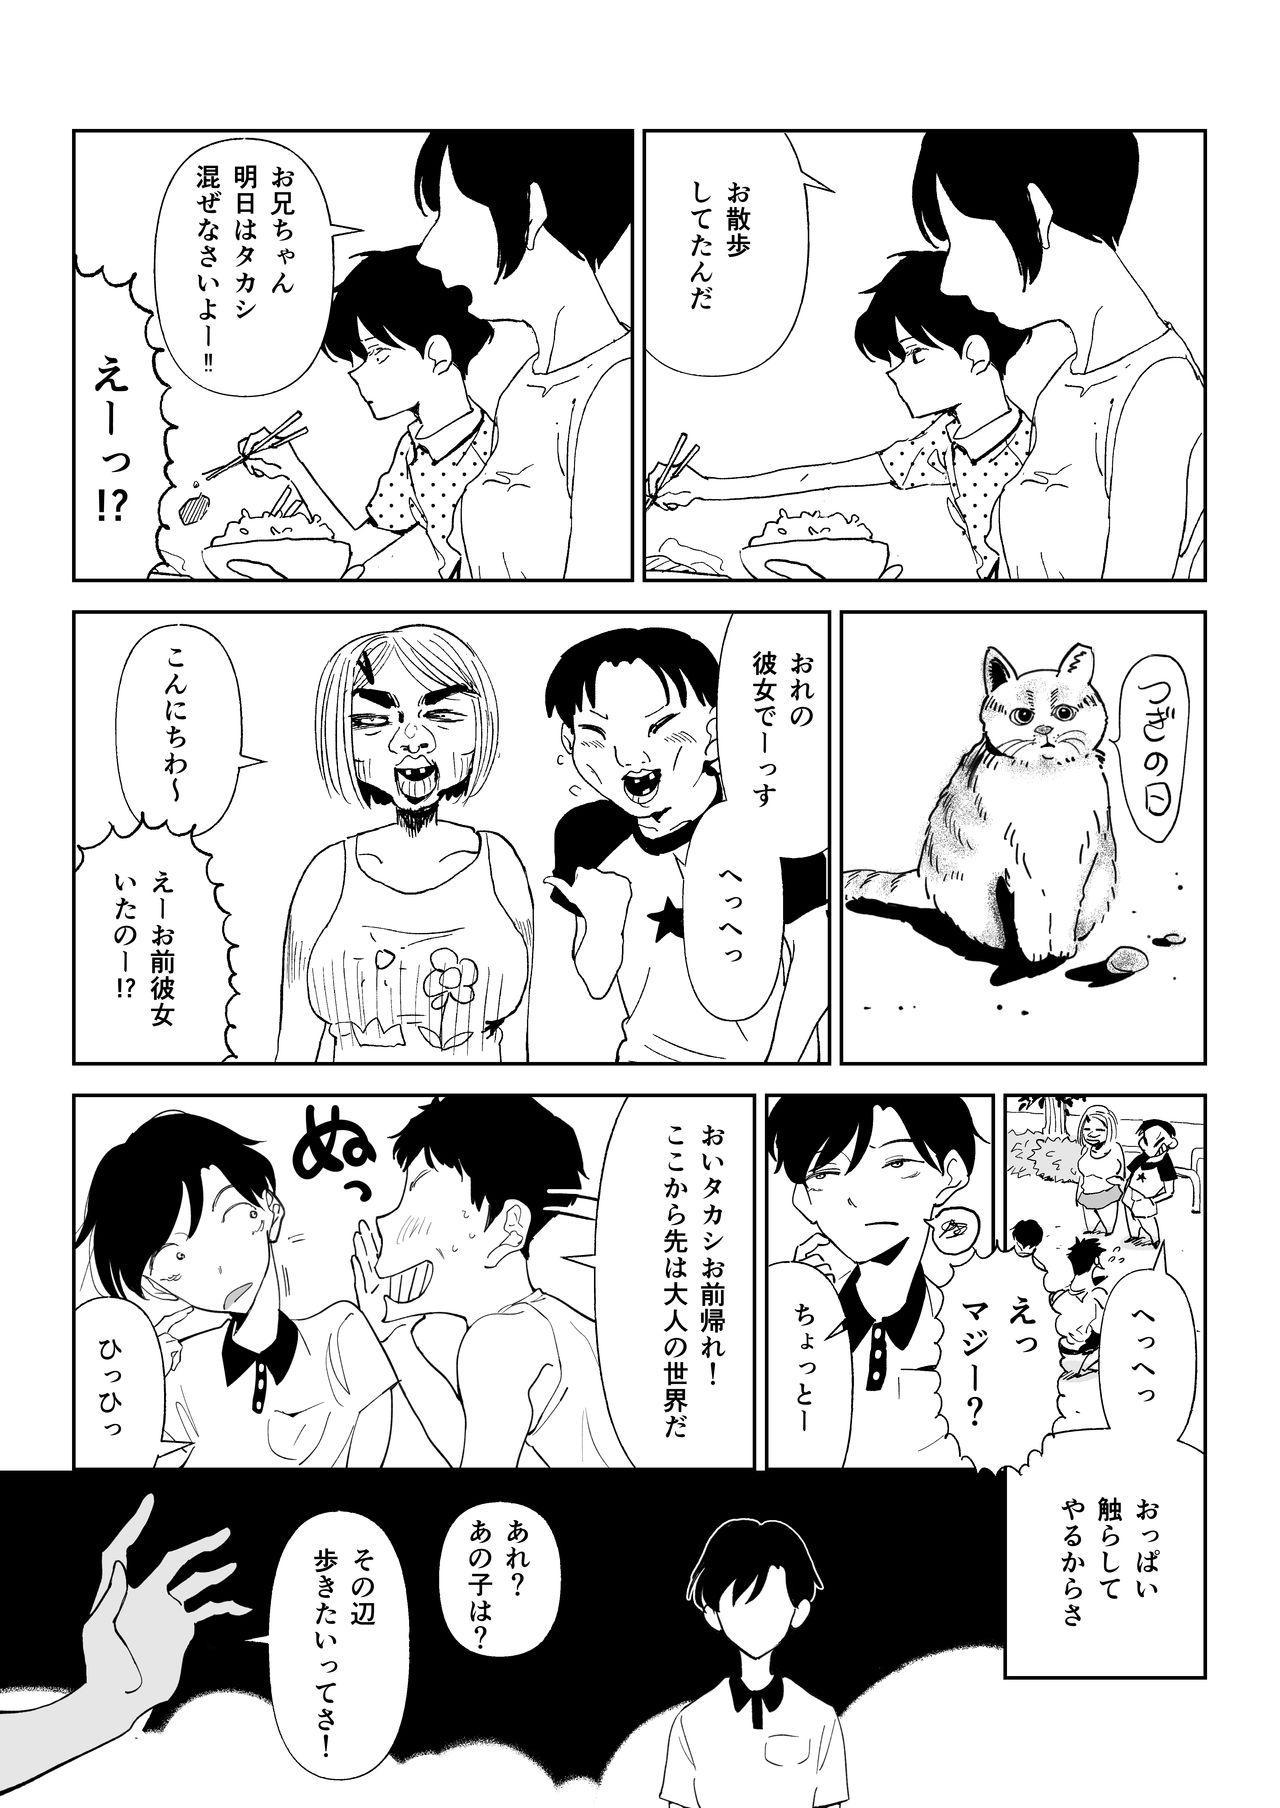 Nagisa no Kyonyuu Onee-san 14